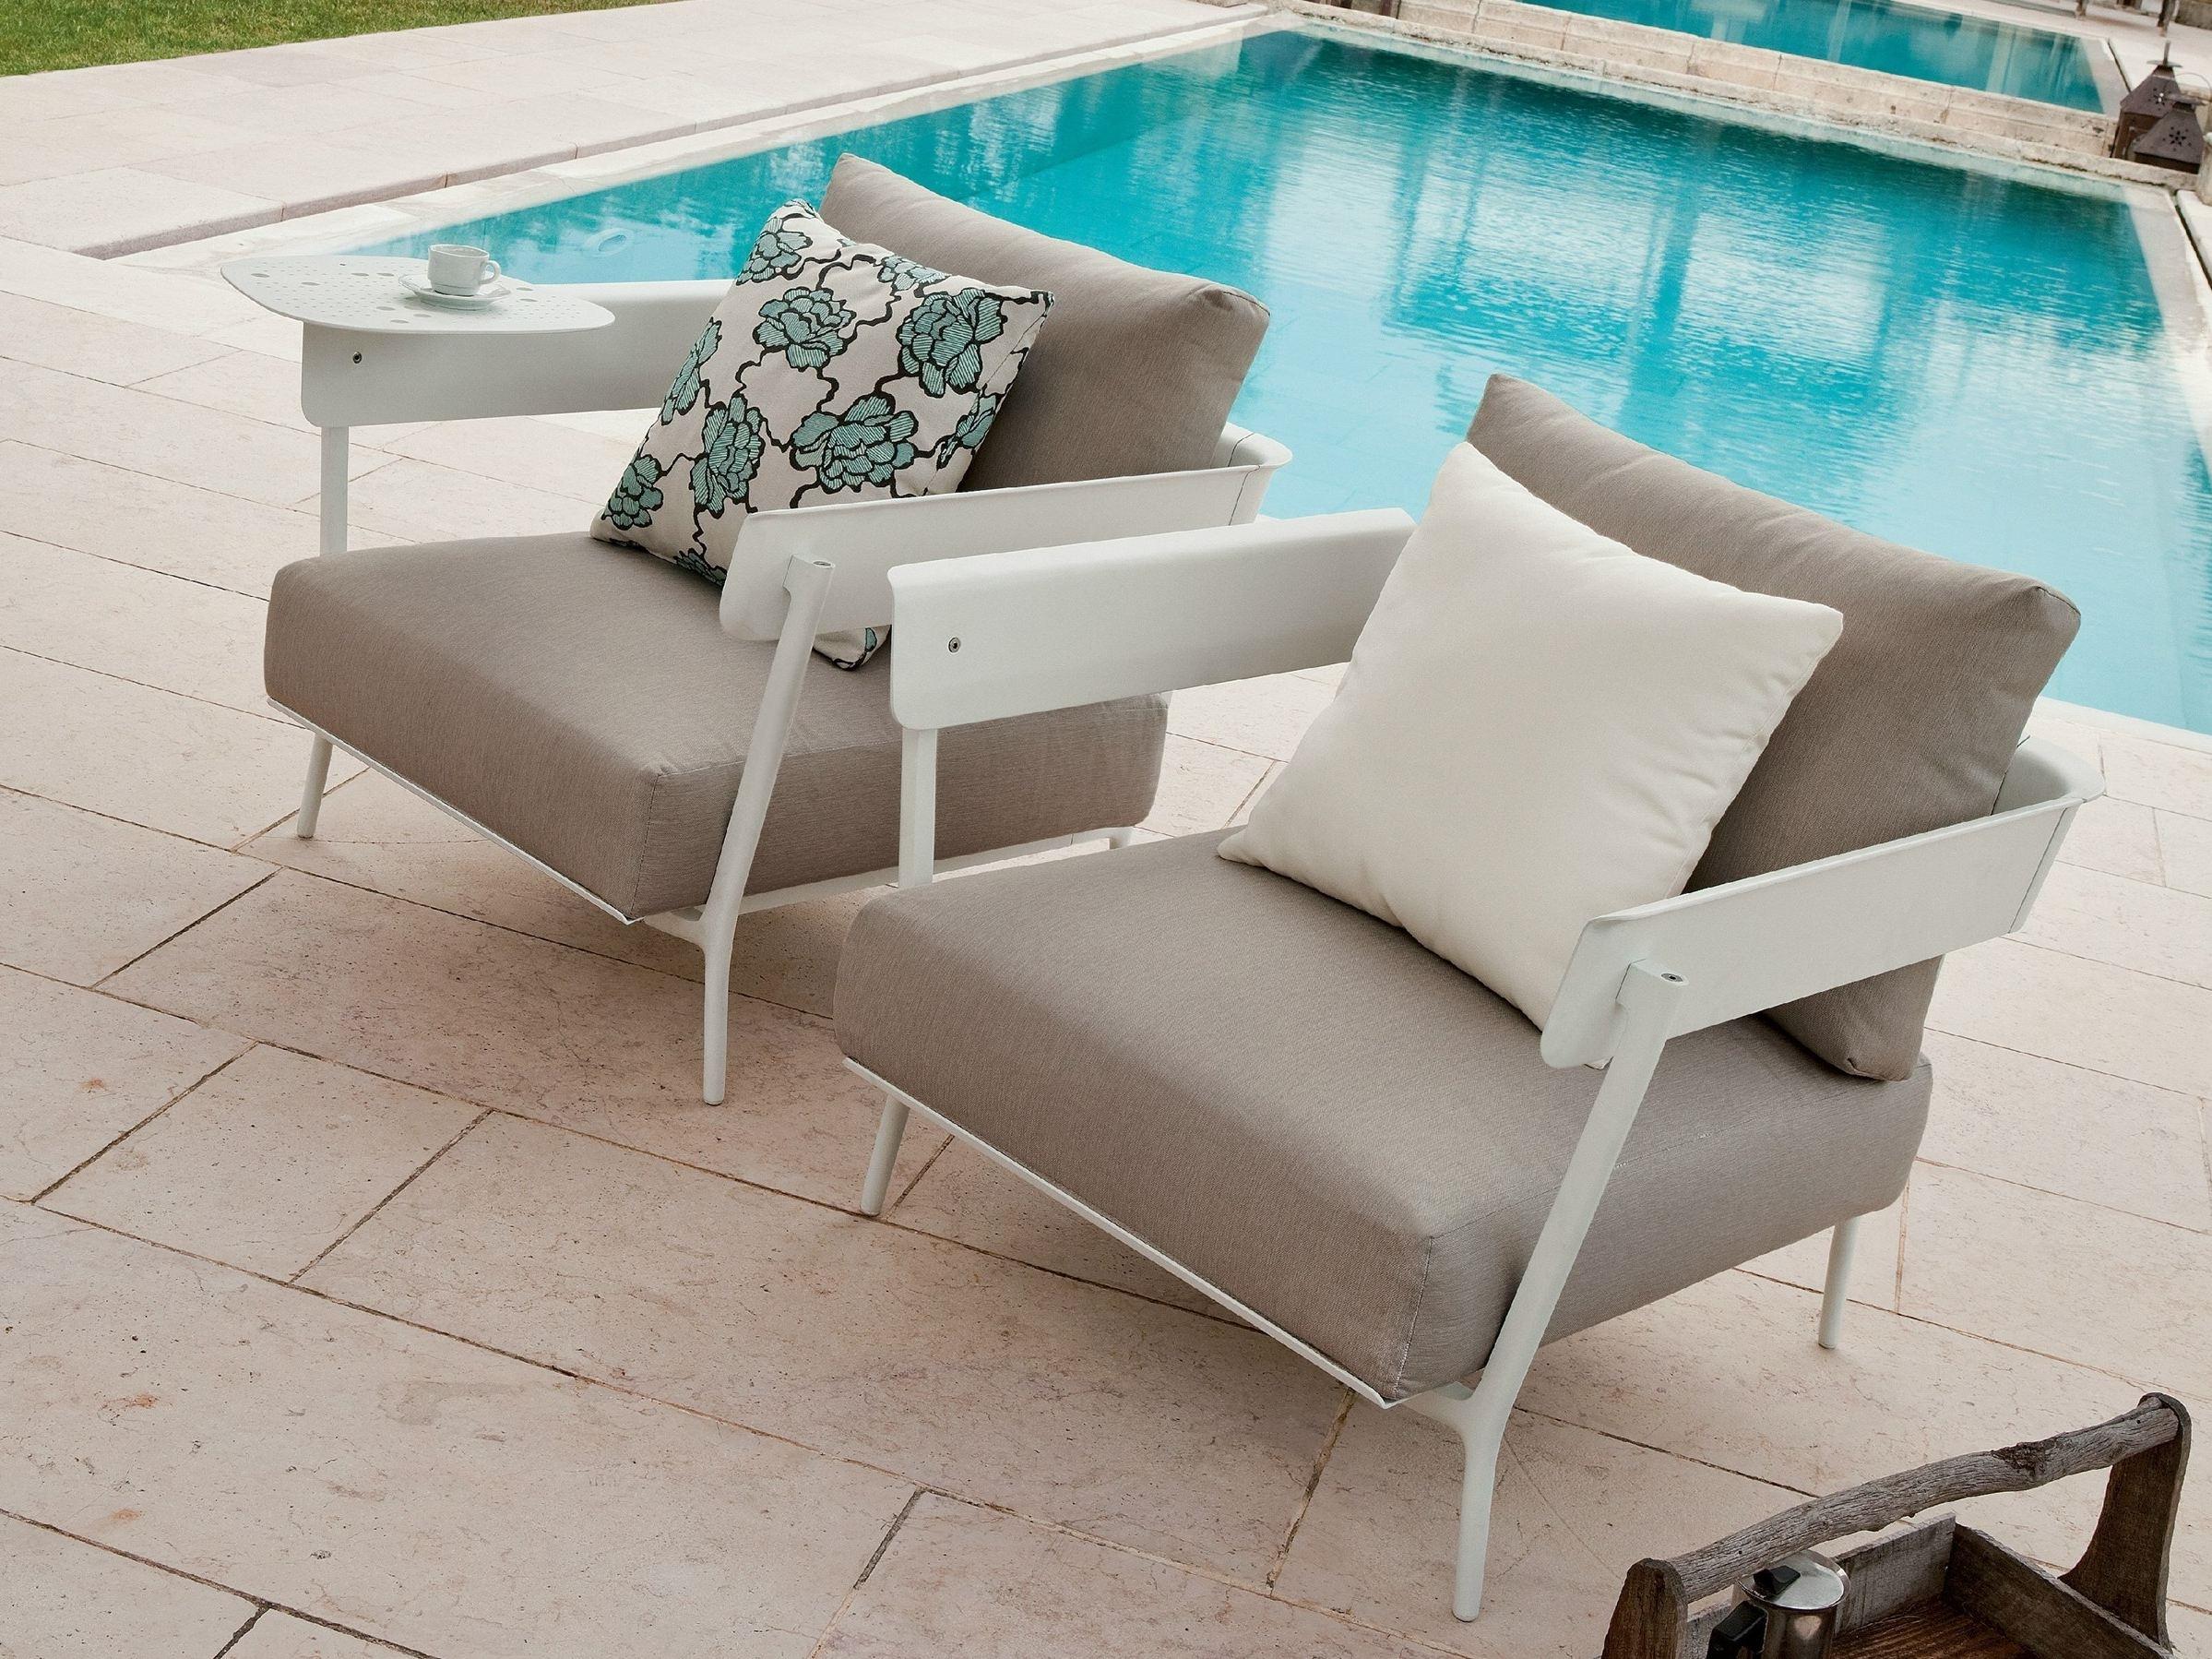 poltrone da giardino mobili giardino poltrone per On poltrone da giardino amazon